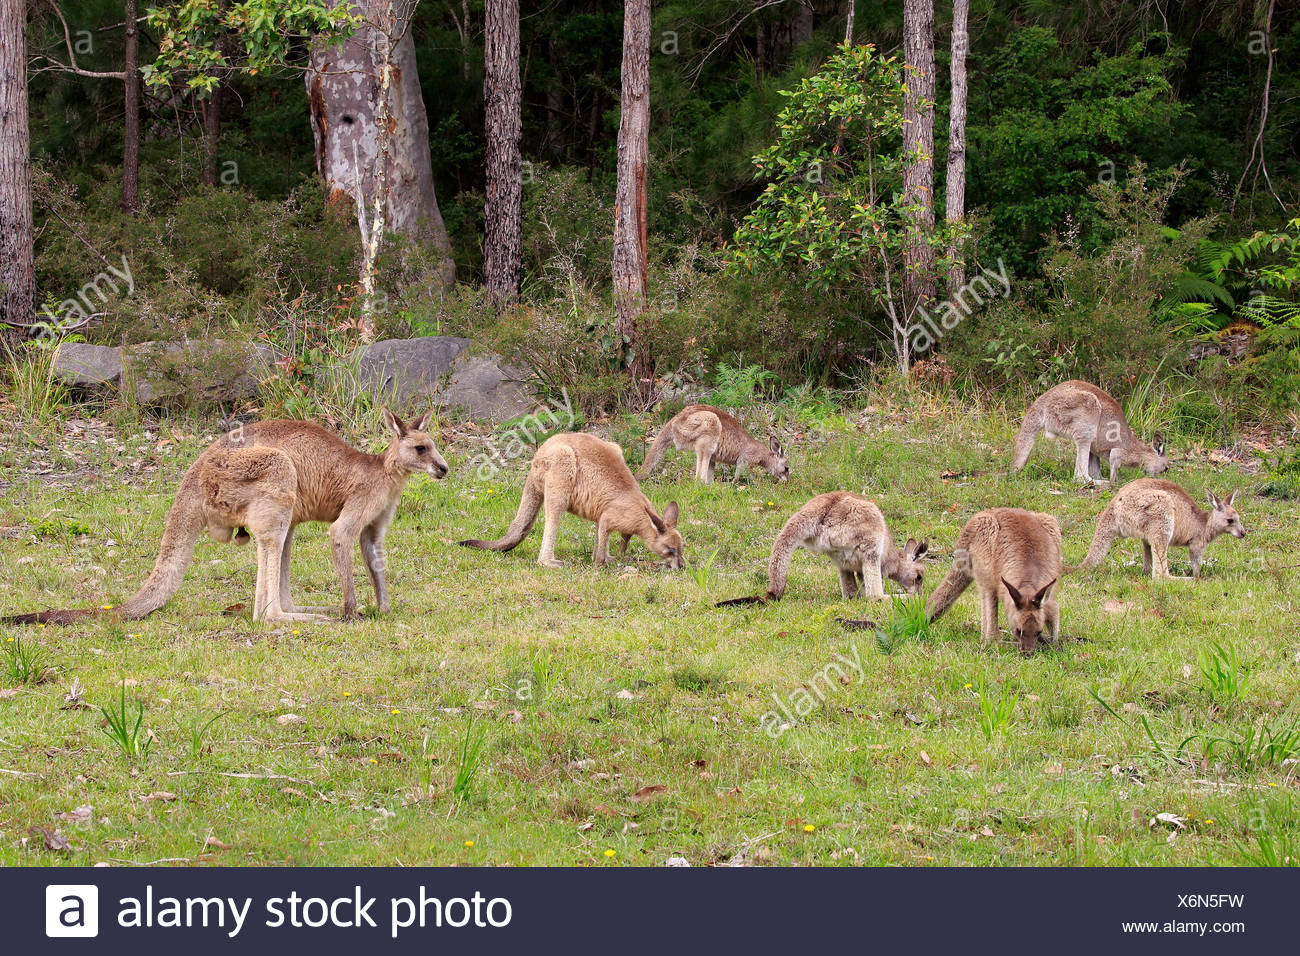 Eastern Gray Kangaroo (Macropus giganteus), group feeding, foraging, Merry Beach, Murramarang National Park, New South Wales - Stock Image